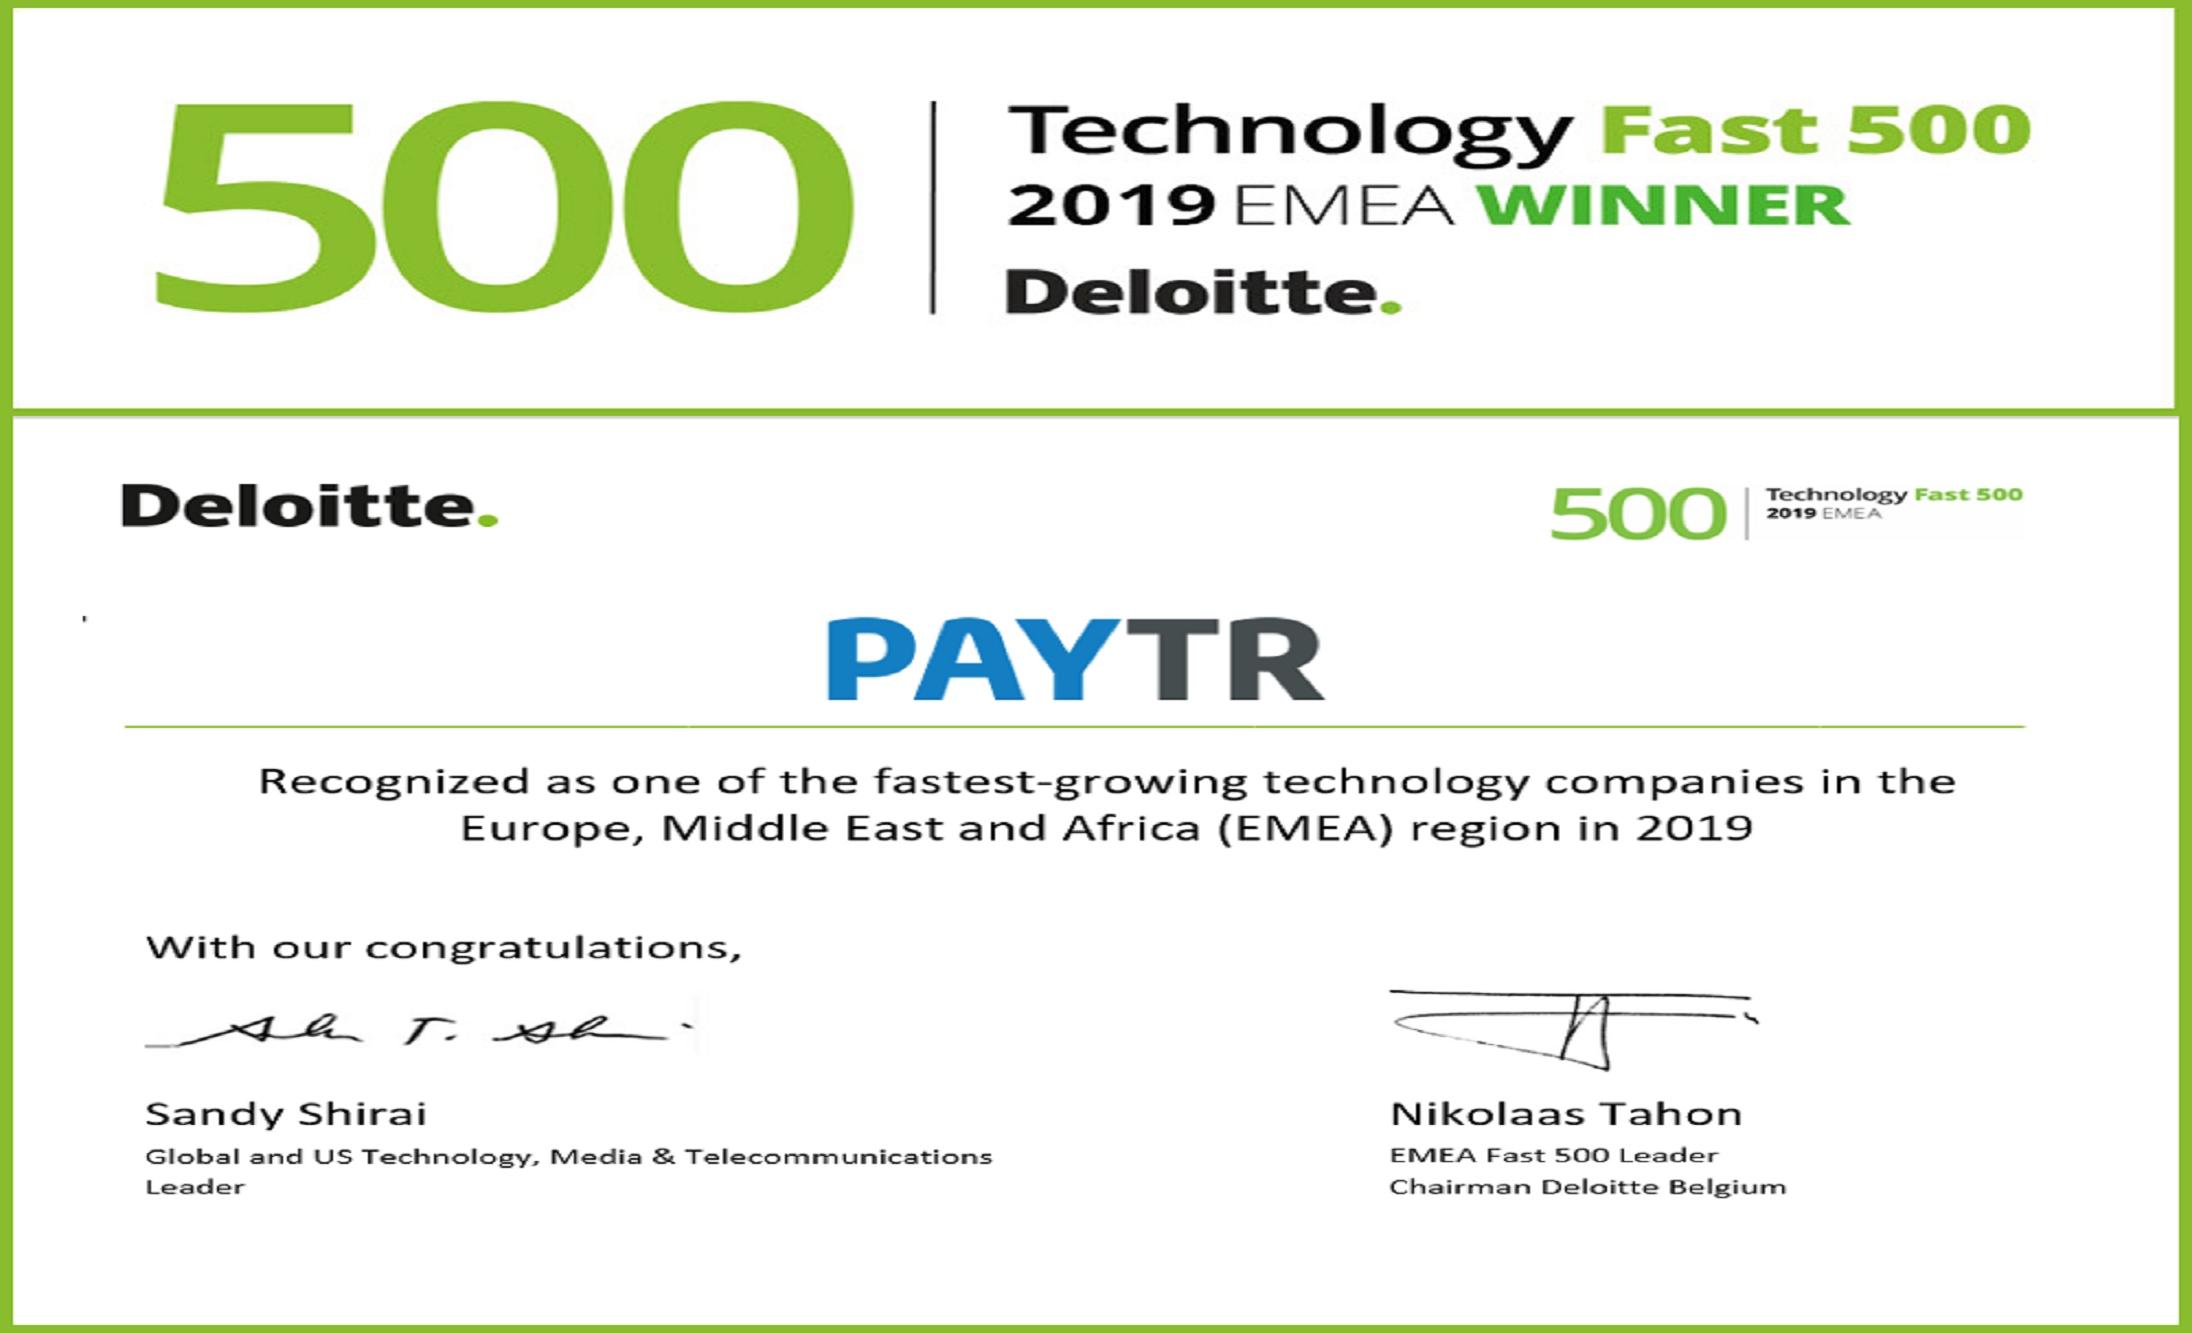 Simsoft, Bir Kez Daha Deloitte Technology Fast 500 EMEA Listesinde!